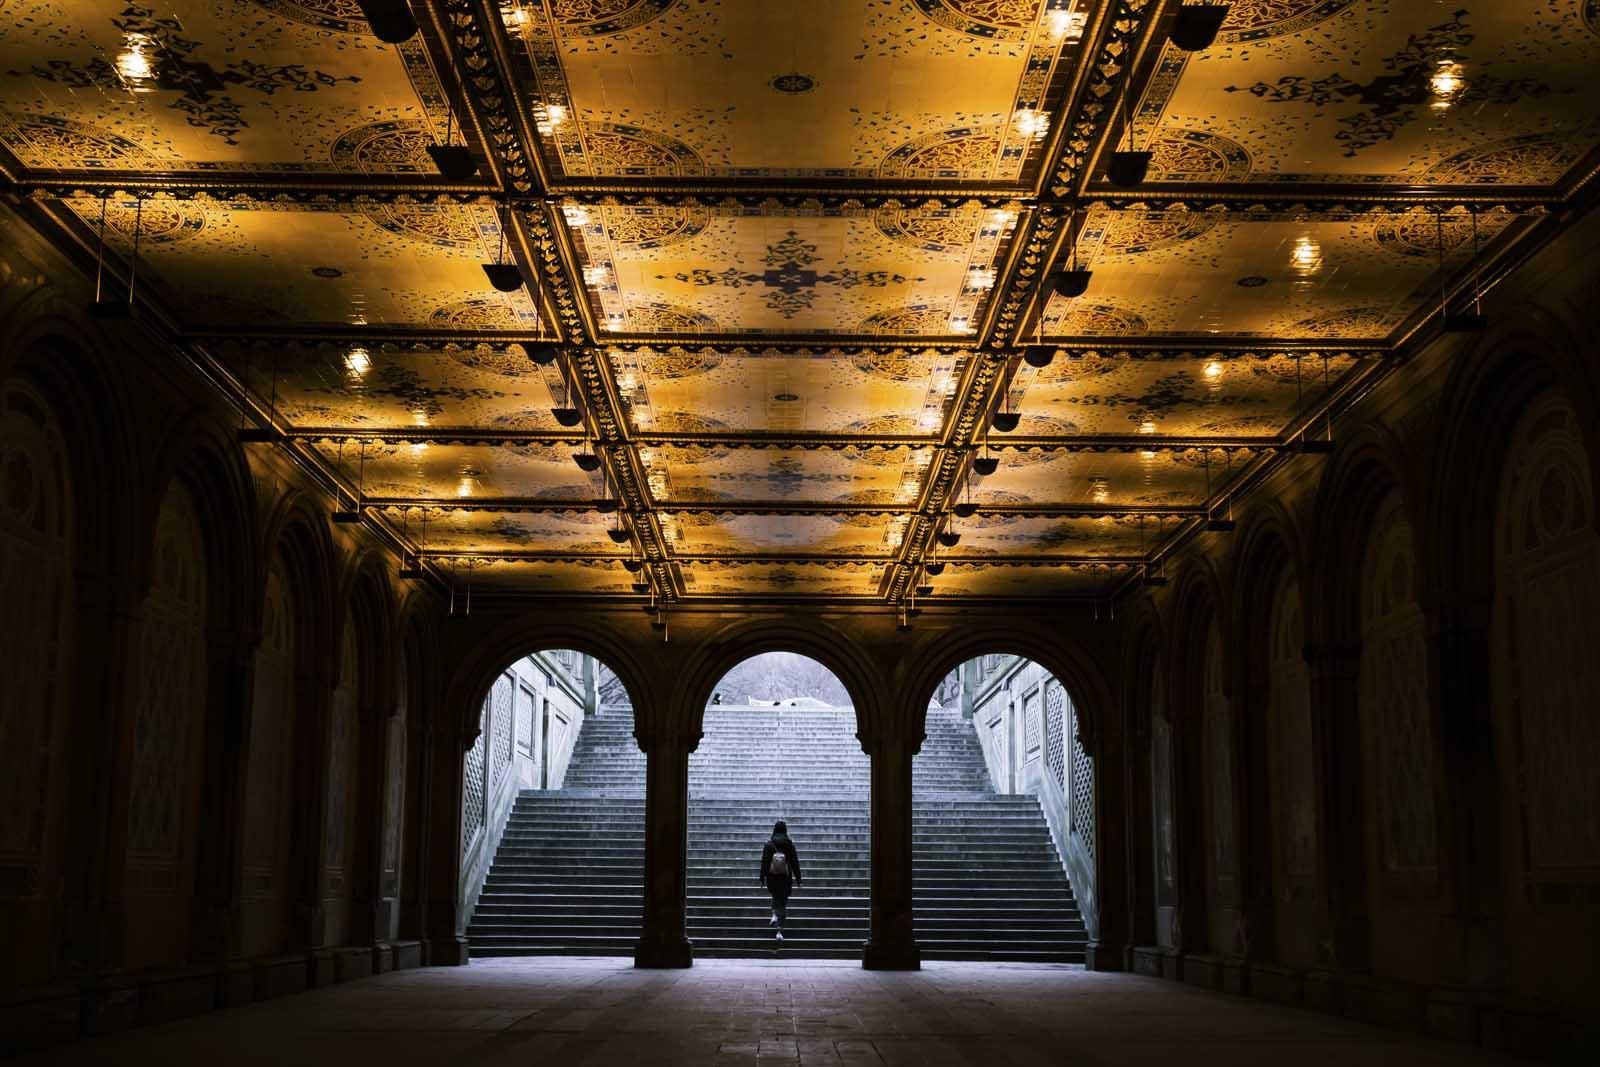 Central Park Bethesda Arcade